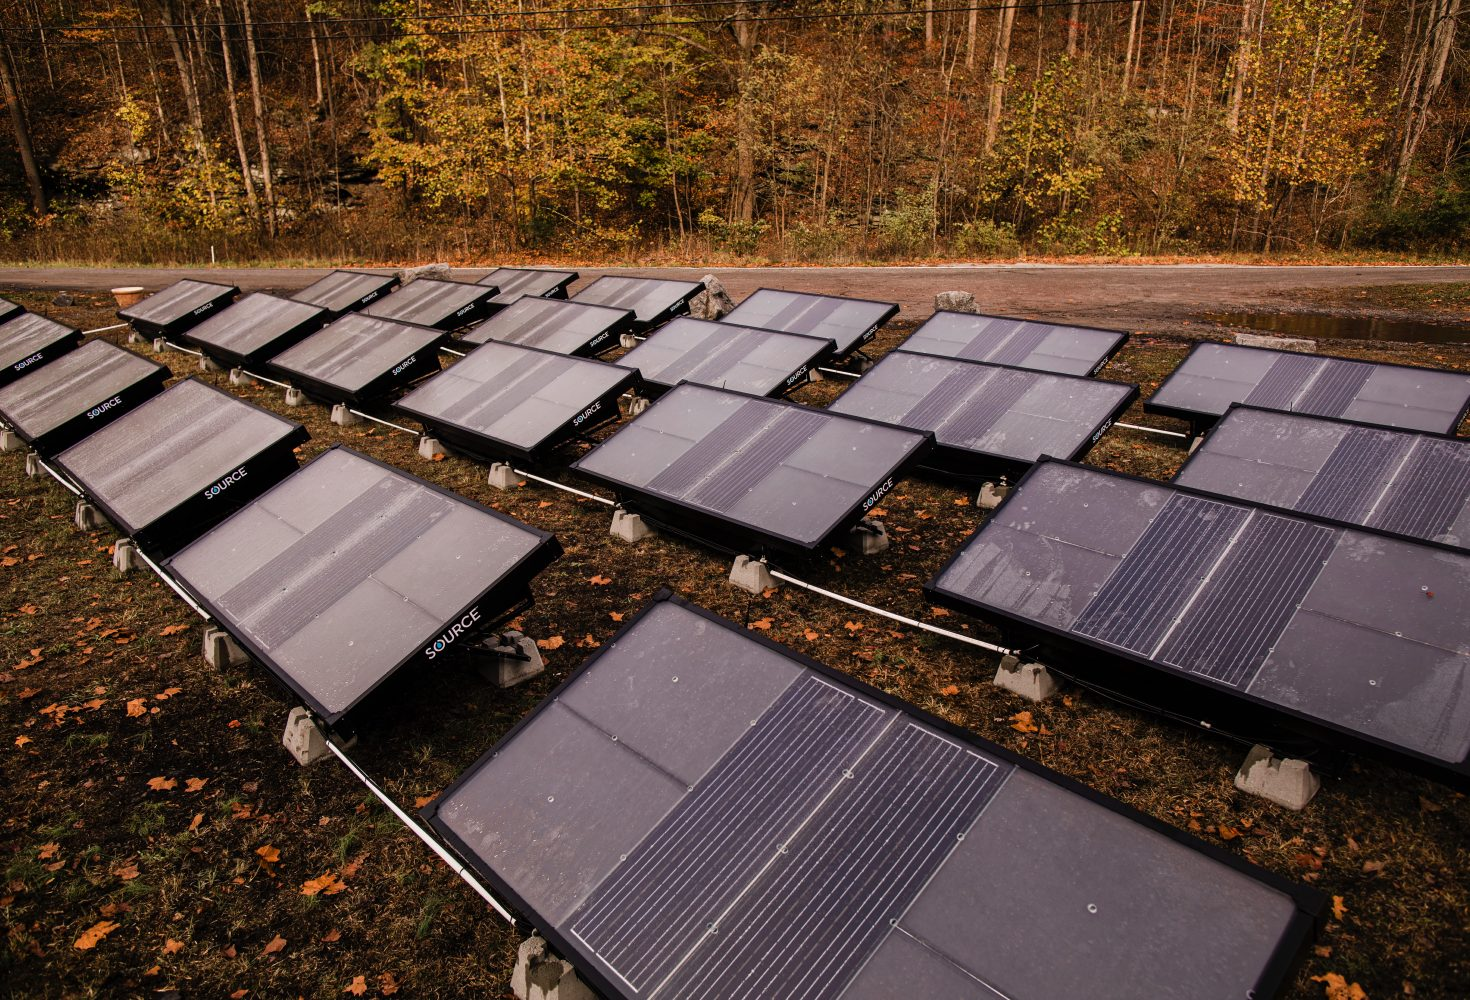 Hidropáneles solares que extraen agua del aire, ¿el futuro del agua potable?